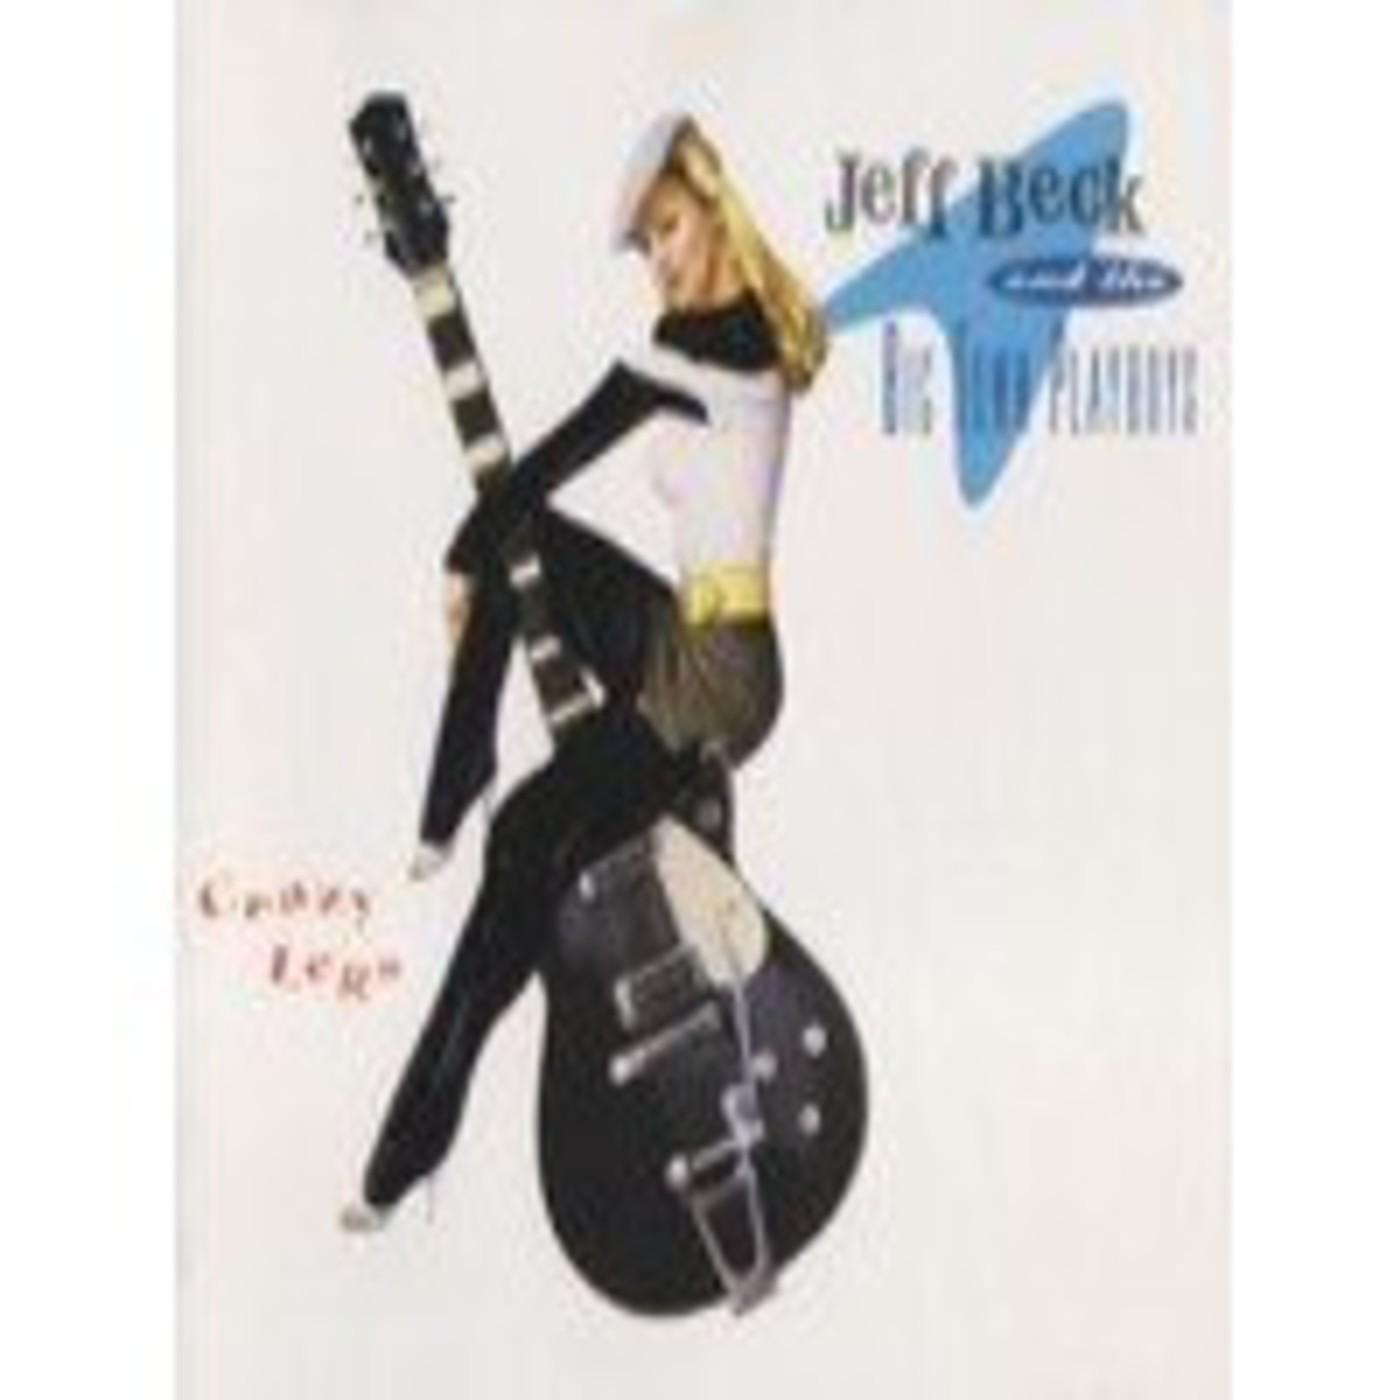 Jeff Beck & The Big Town Playboys - Crazy Legs (1993)